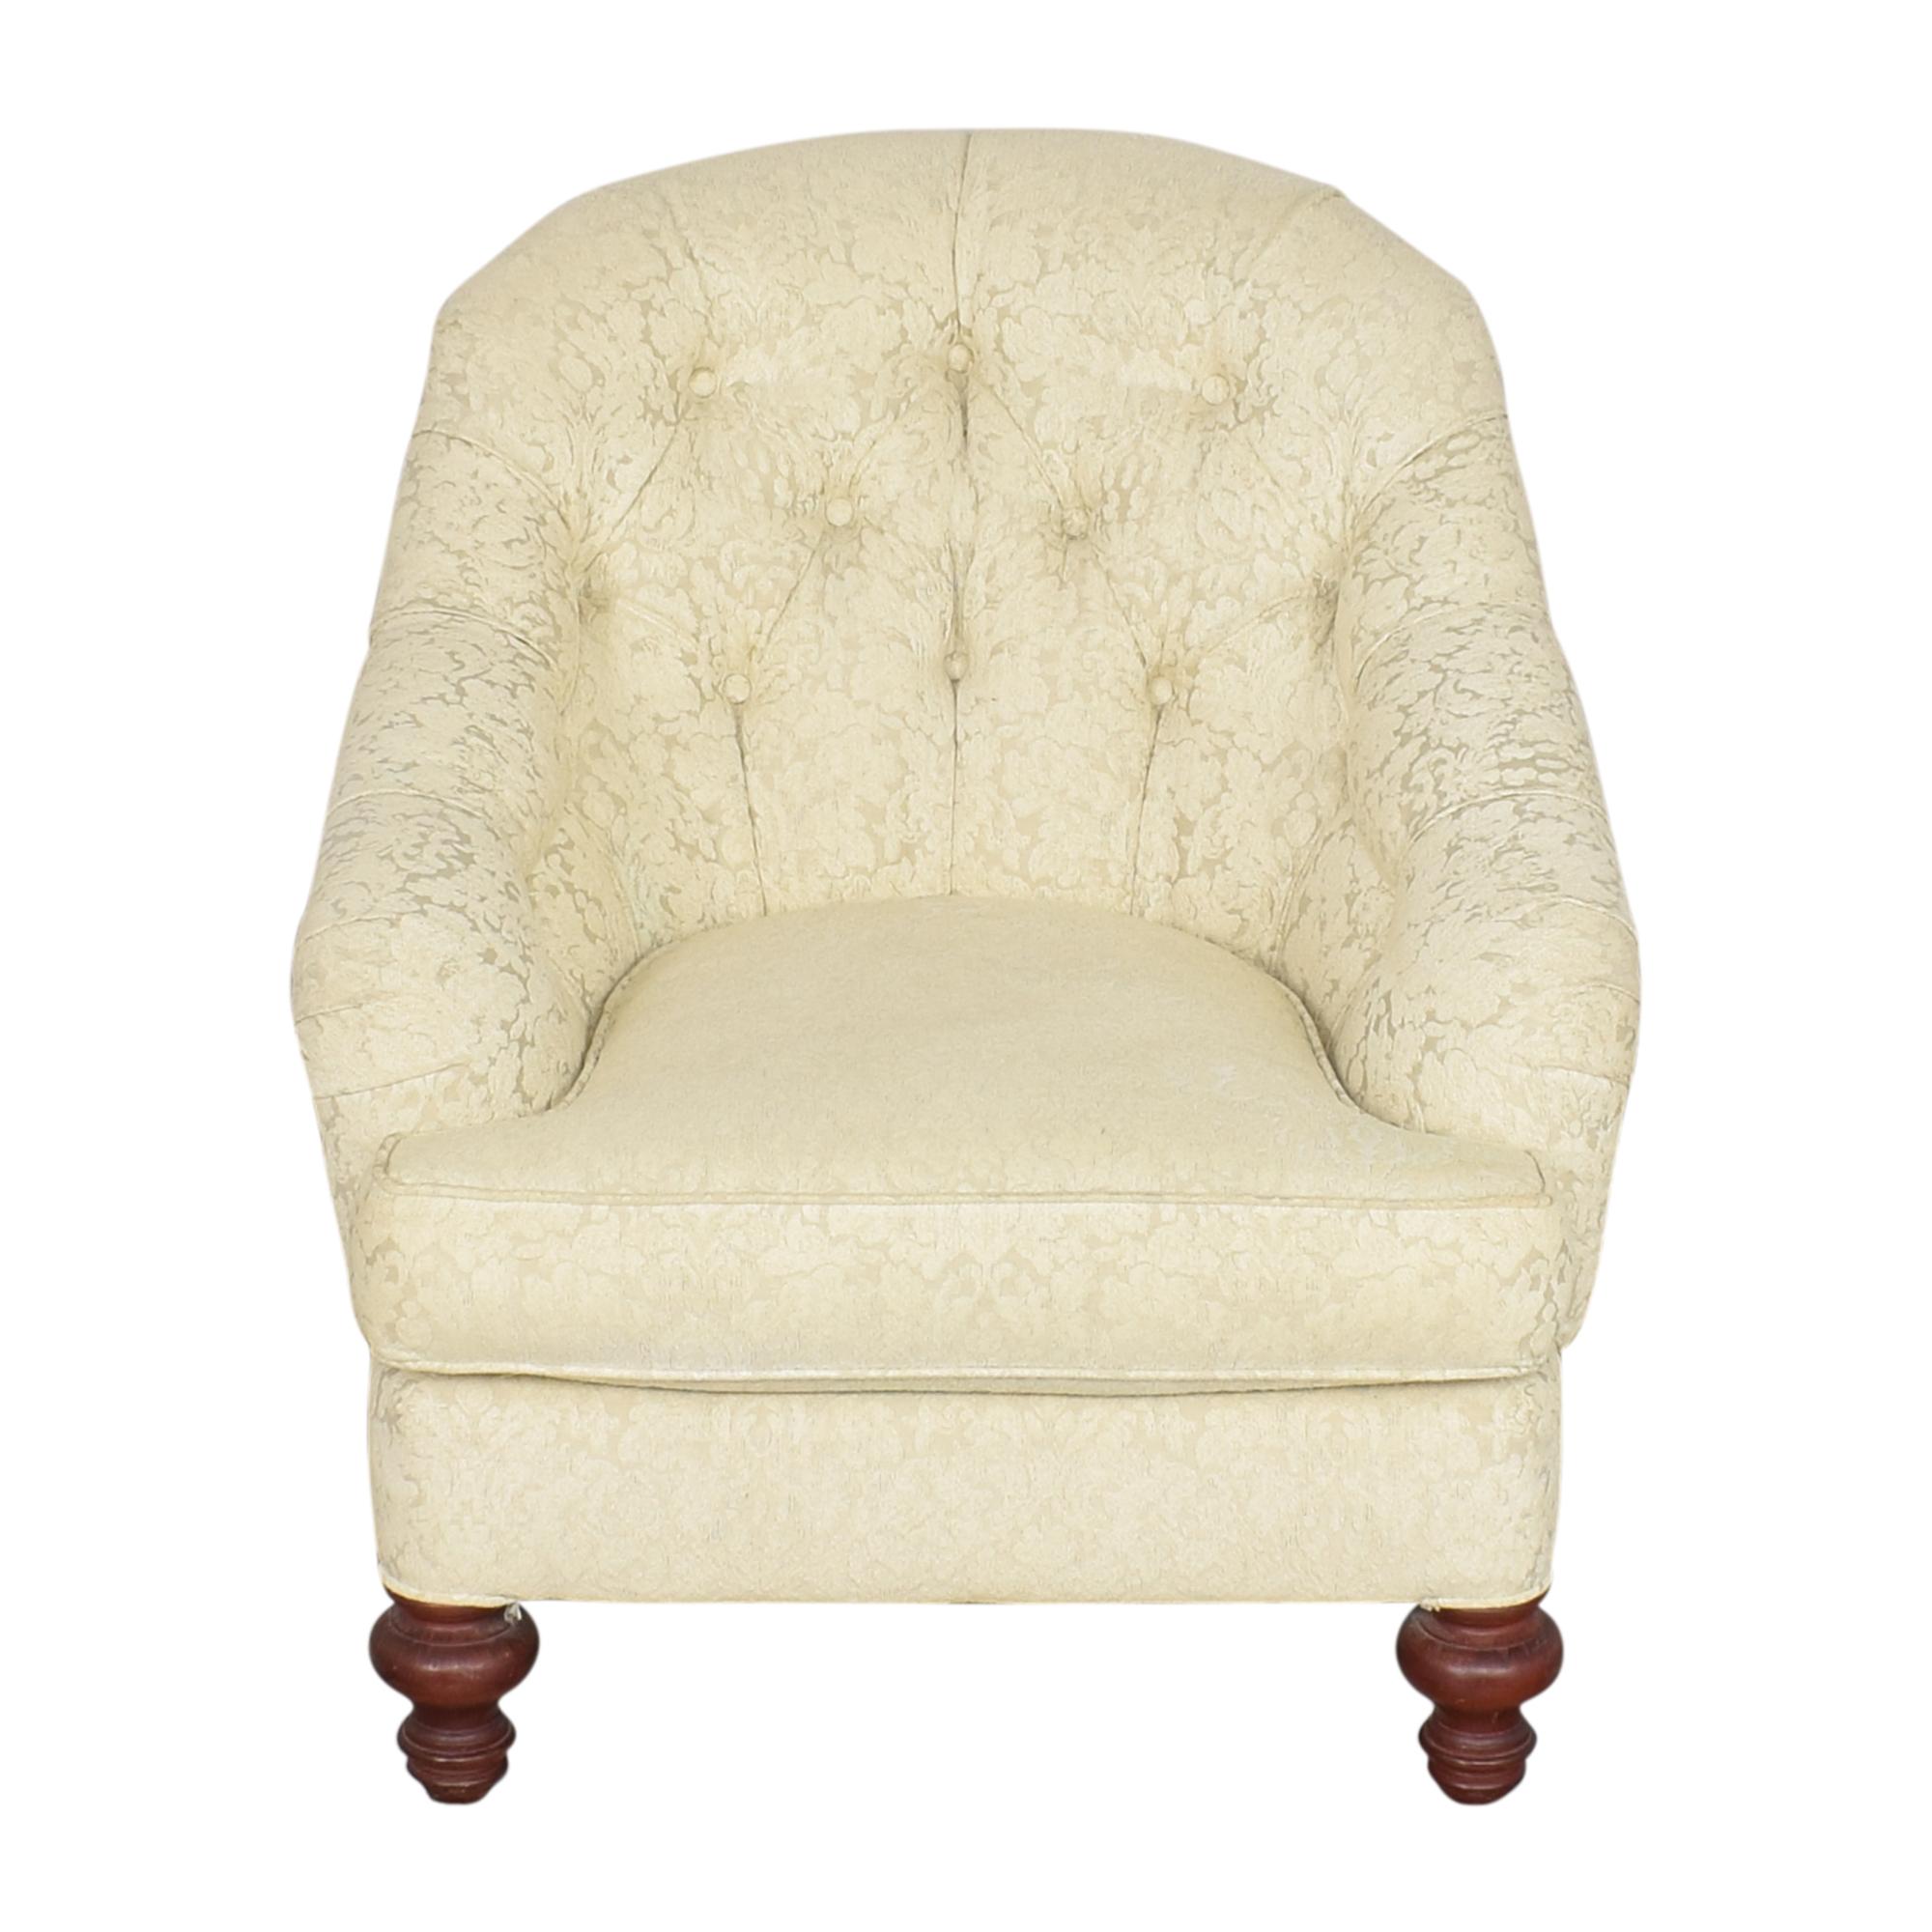 ABC Carpet & Home ABC Carpet & Home Mitchell Gold Accent Chair